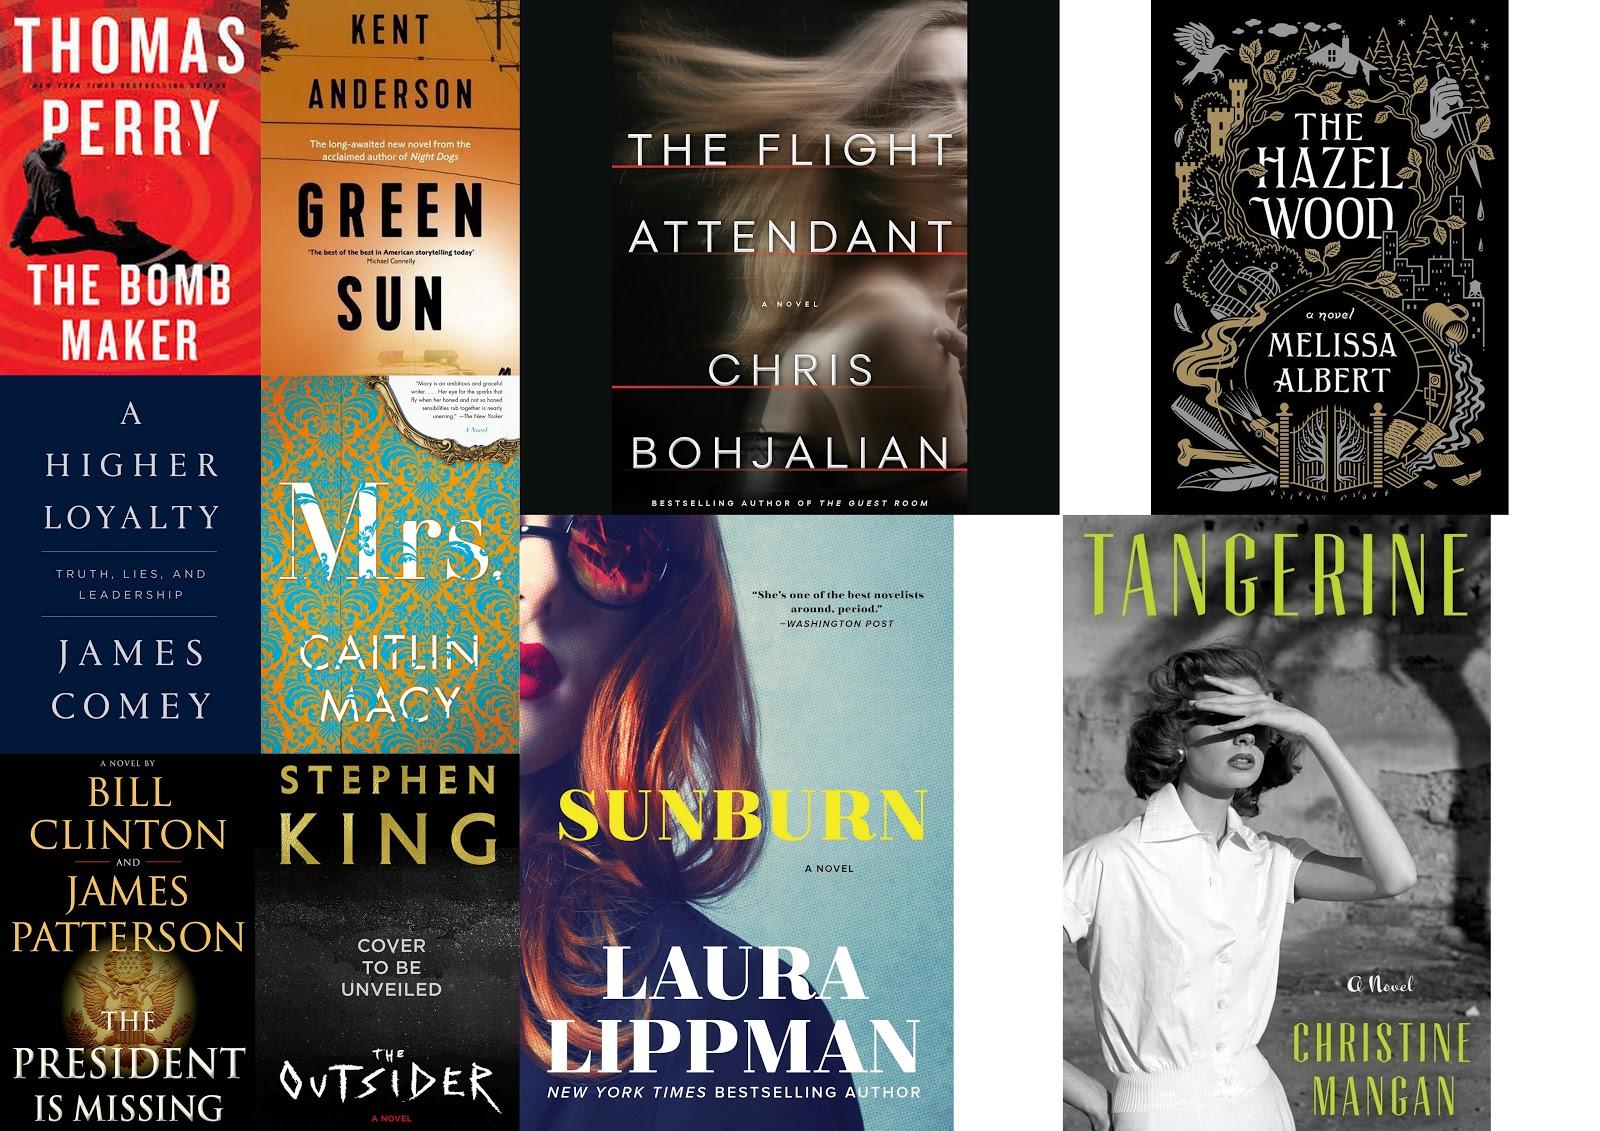 Best Thrillers books 2018, Good thriller Crime mystery book 2018